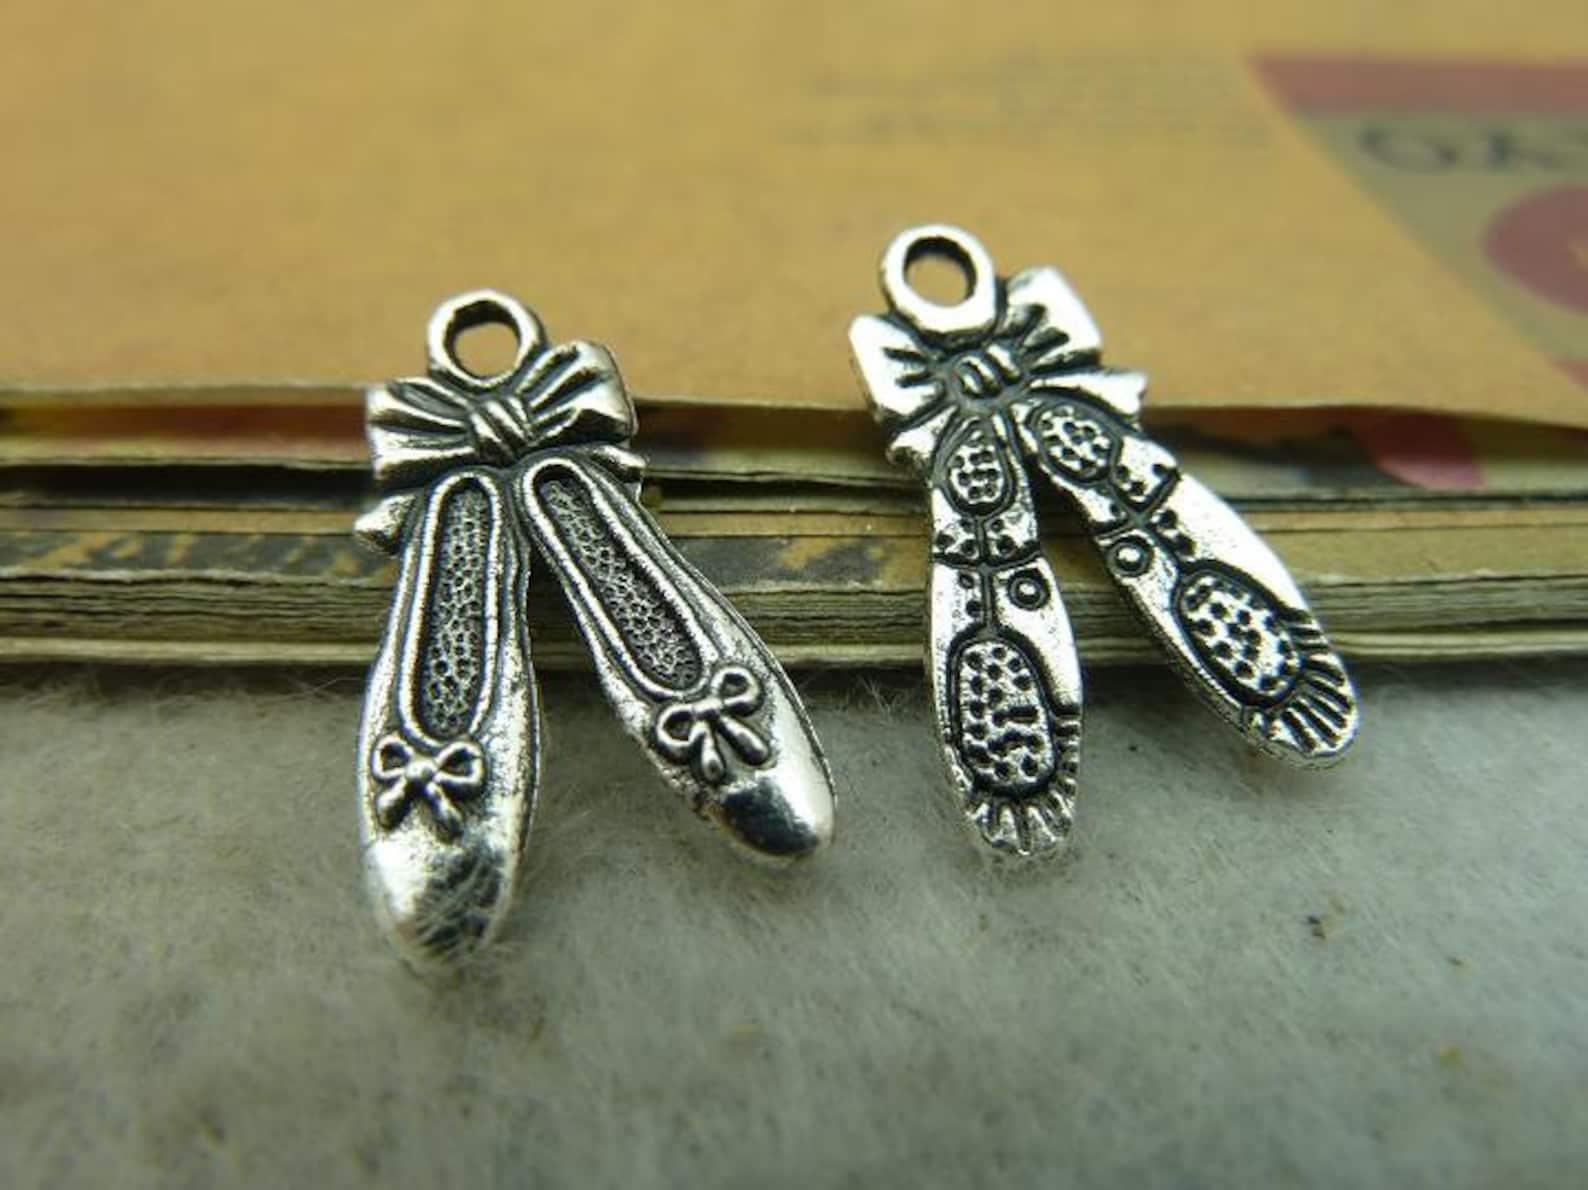 bulk 30 ballet slipper charms antique silver tone 2 sided terrific detail